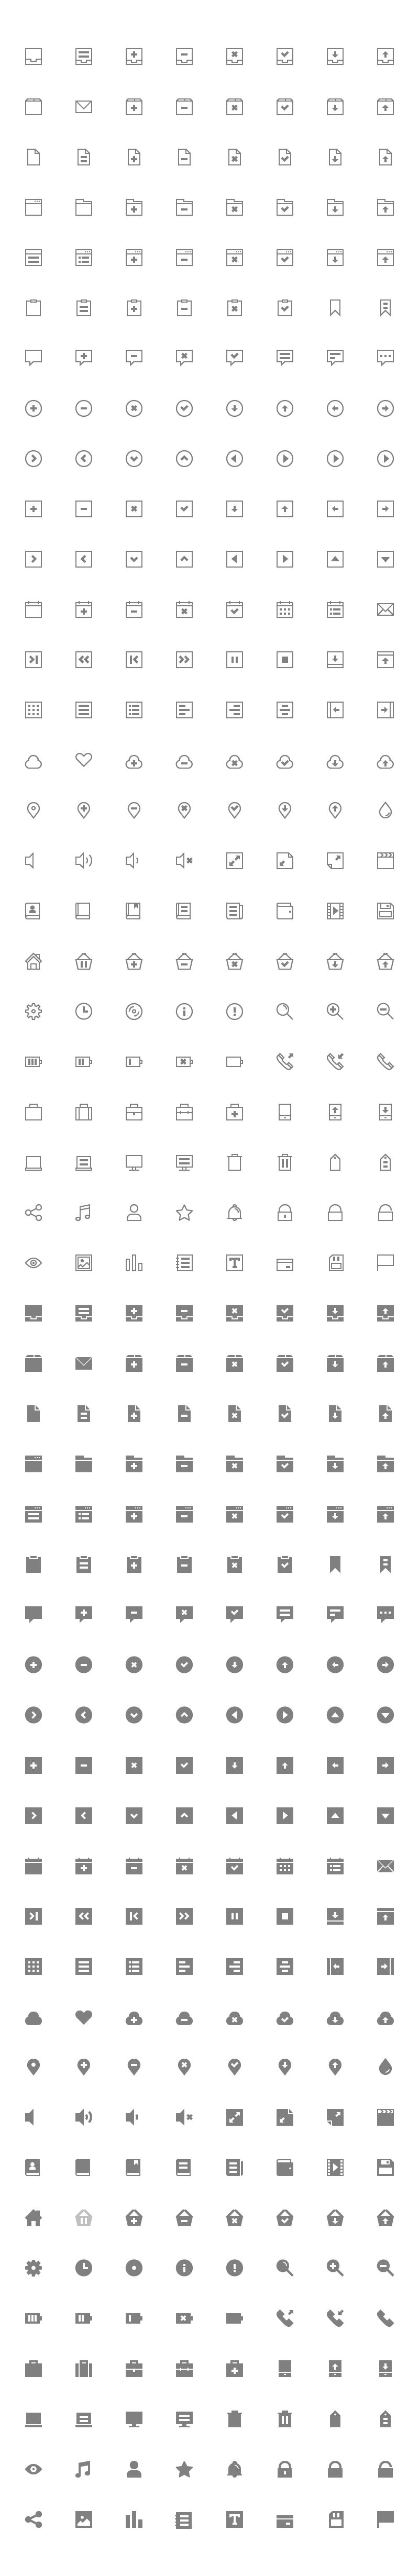 400 Free Icons